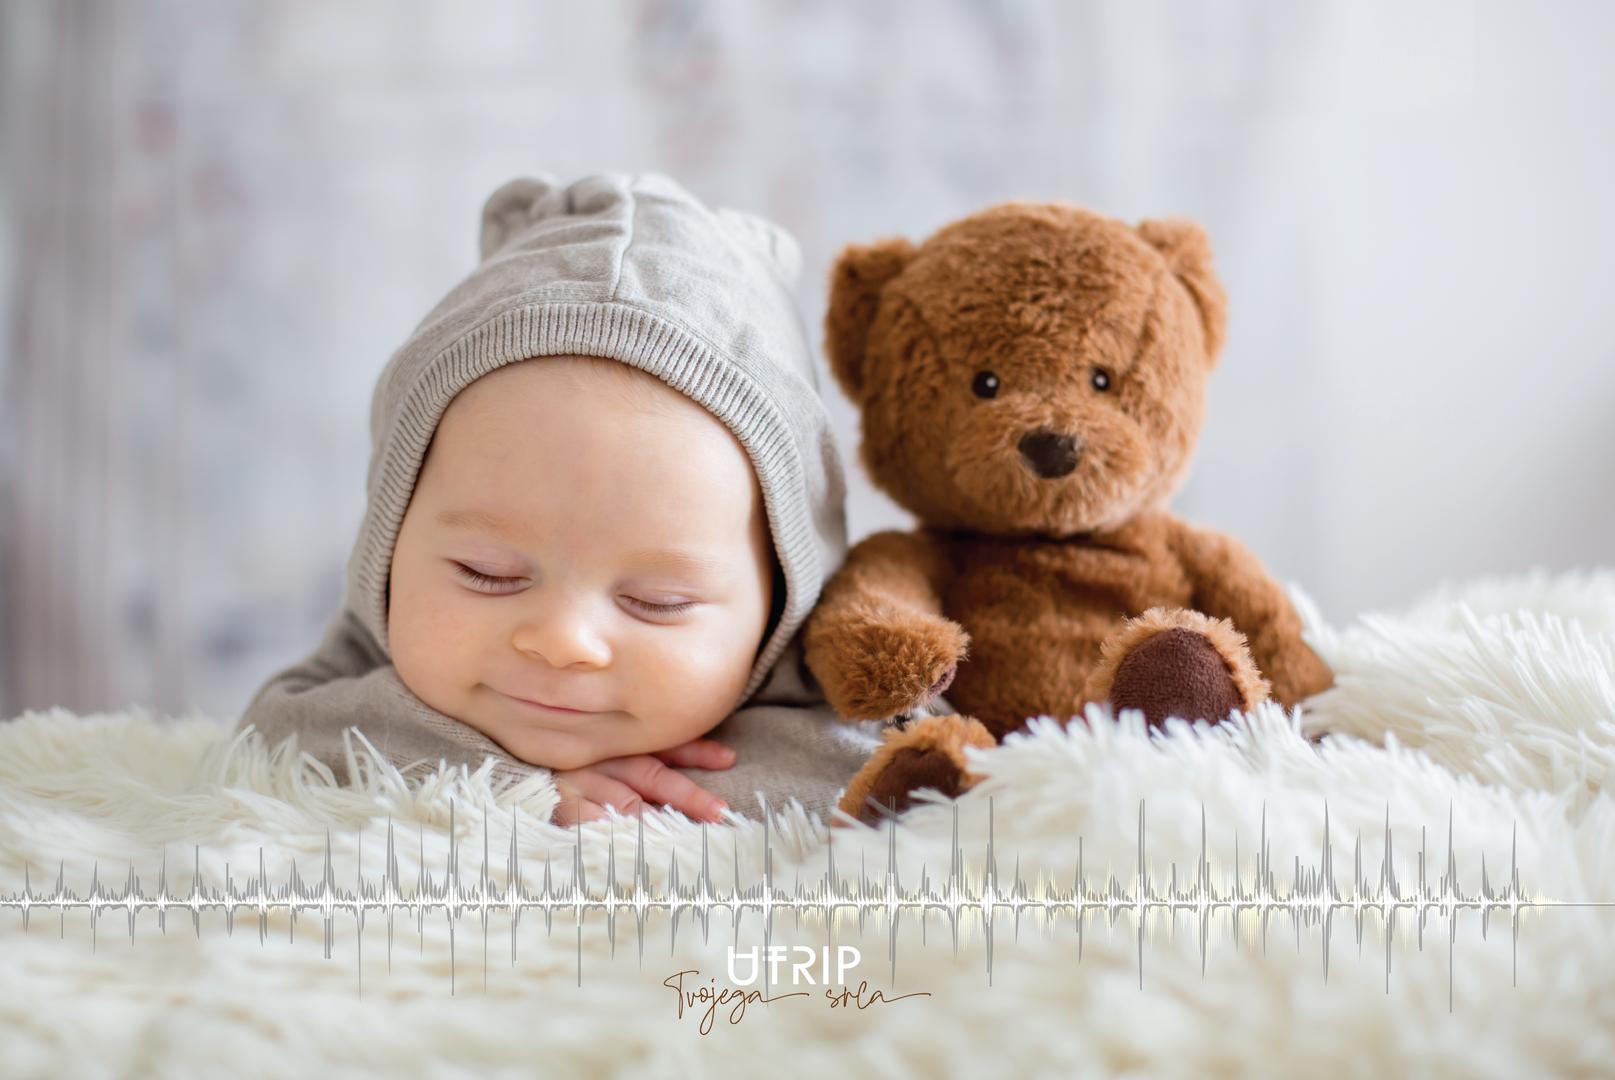 baby_utrip_foto-02.png